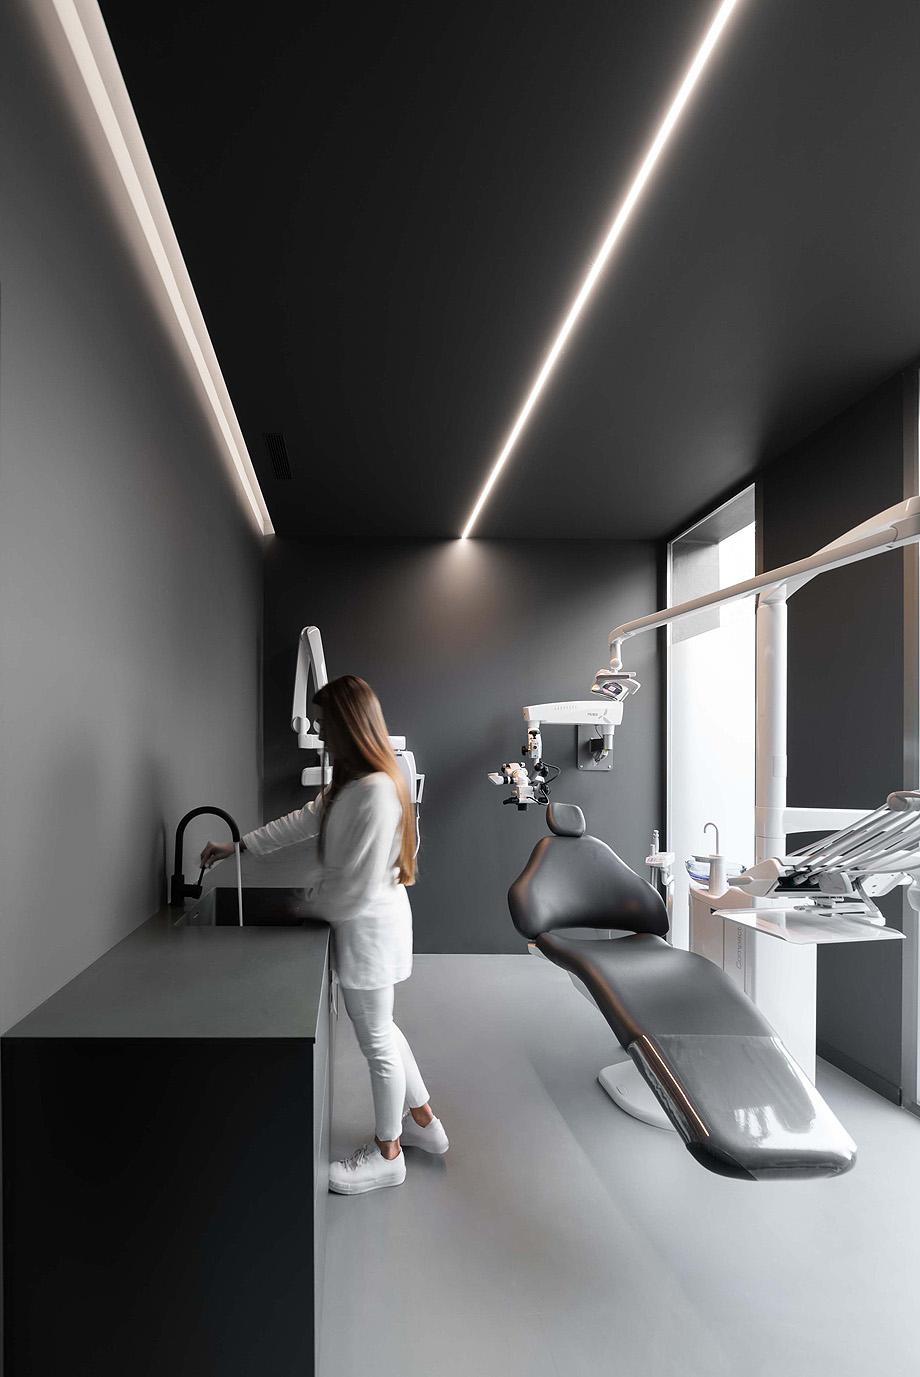 clinica dental en valencia de fran silvestre - foto jesus orrico (7)